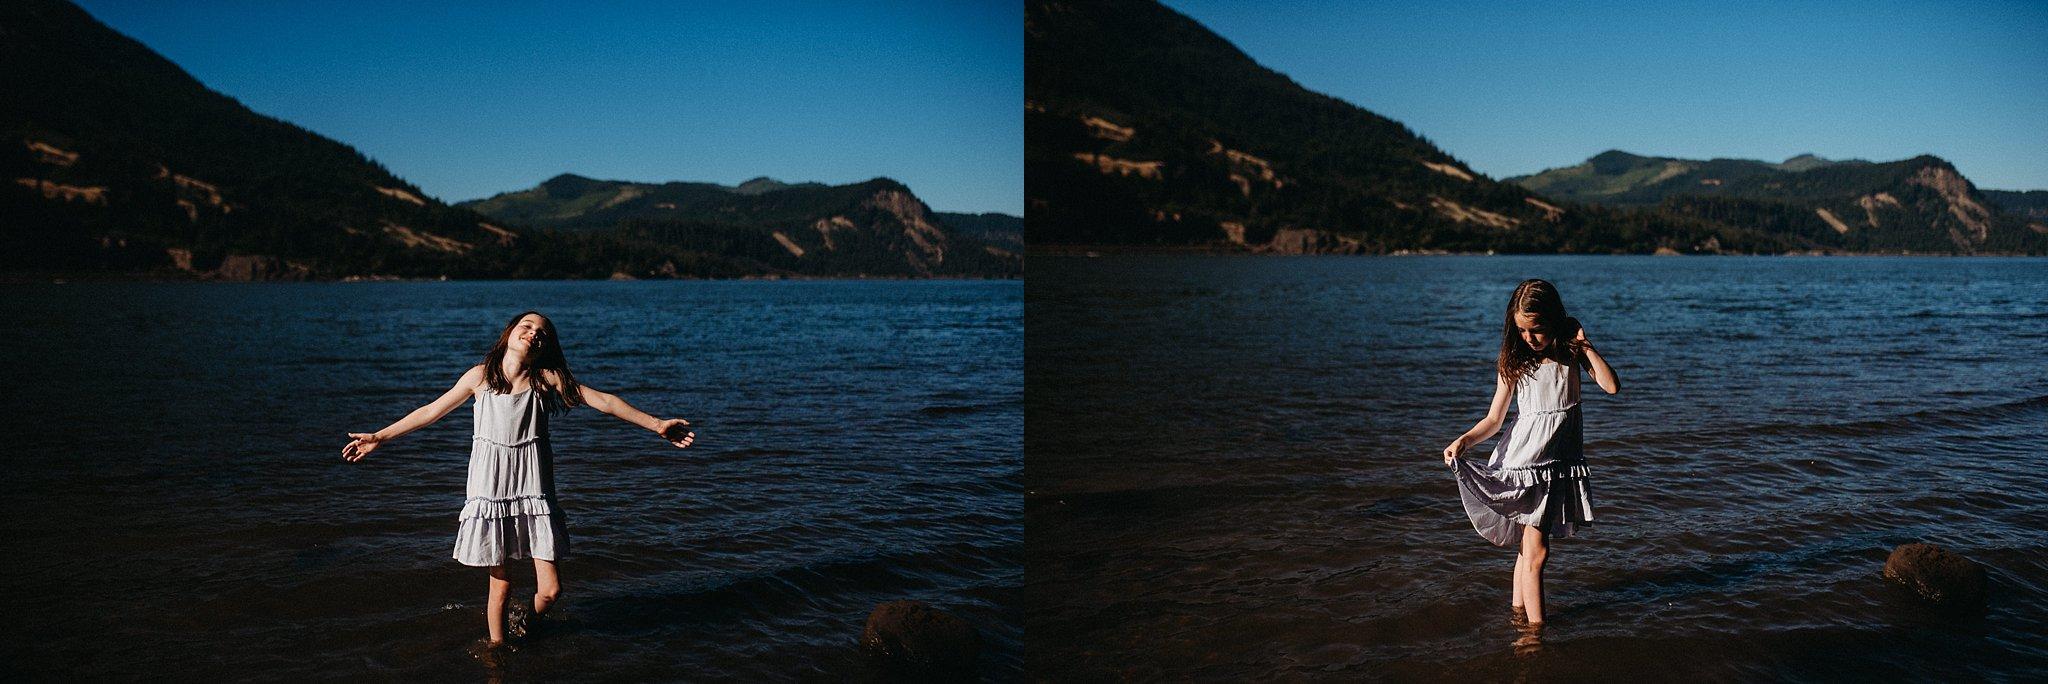 twyla jones photography - treasure coast florida - intimate couples session urban cowboy b&b | brooklyn New York_0054.jpg